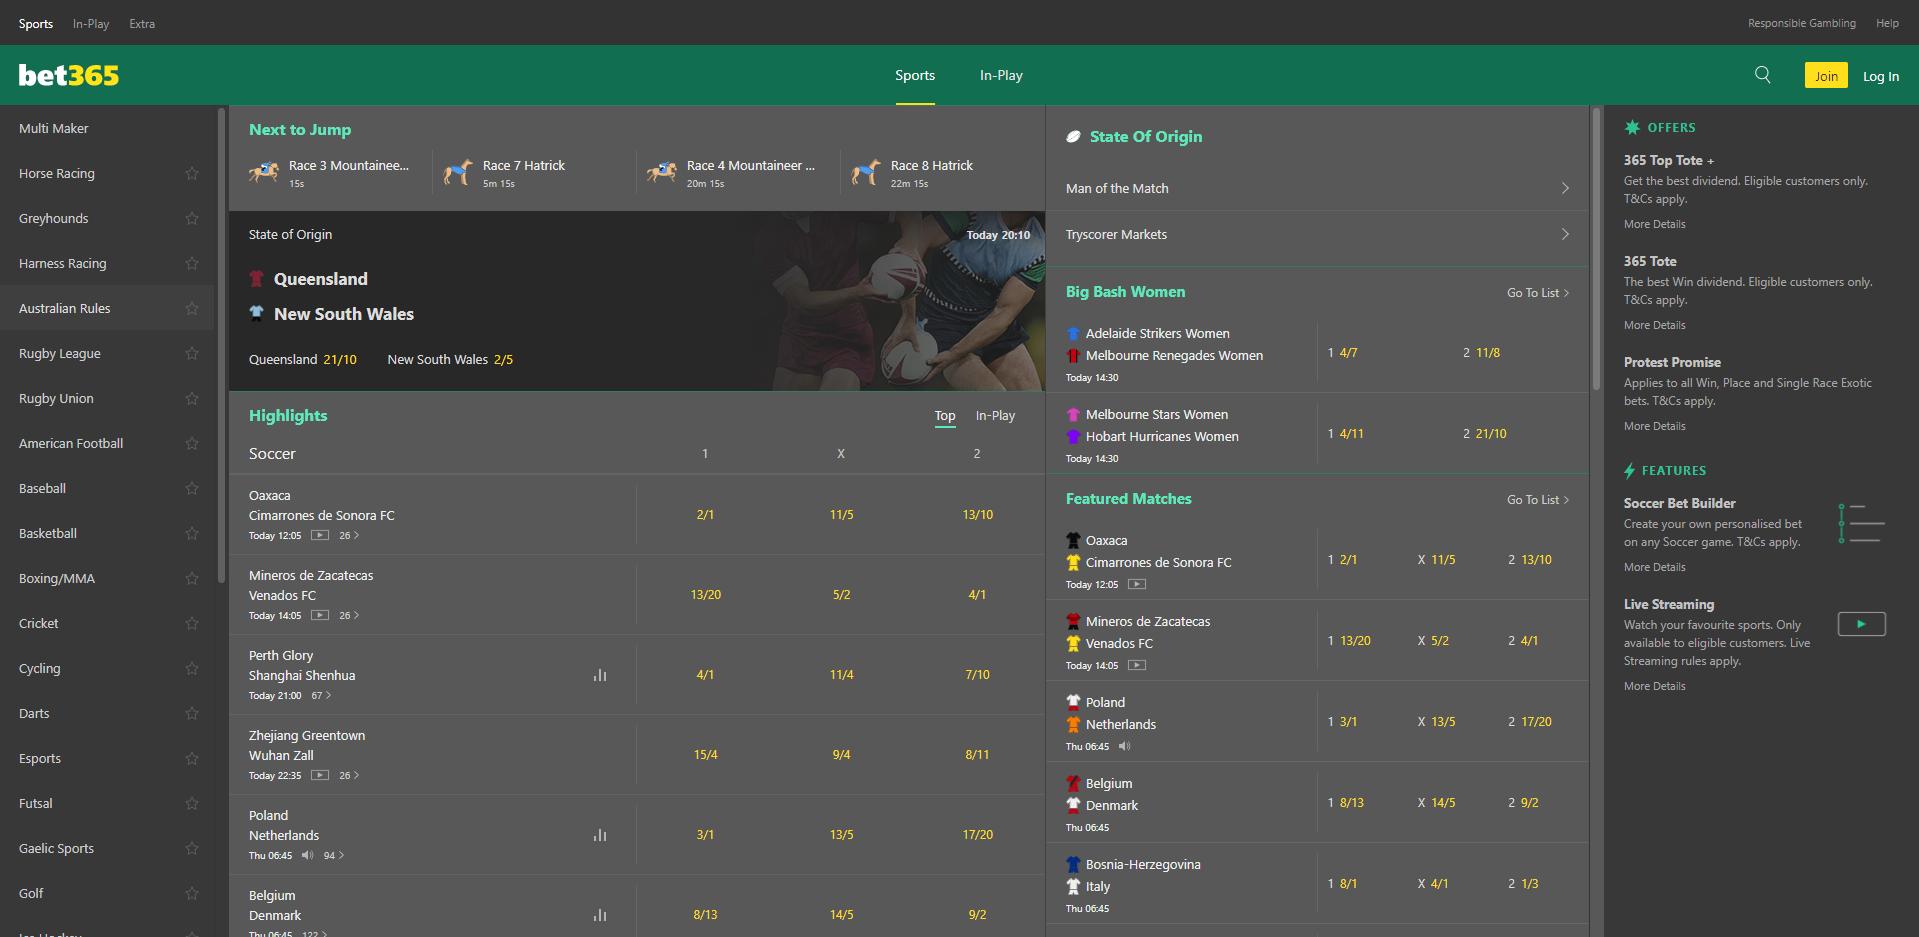 screenshot of the bet365 sportsbook homepage